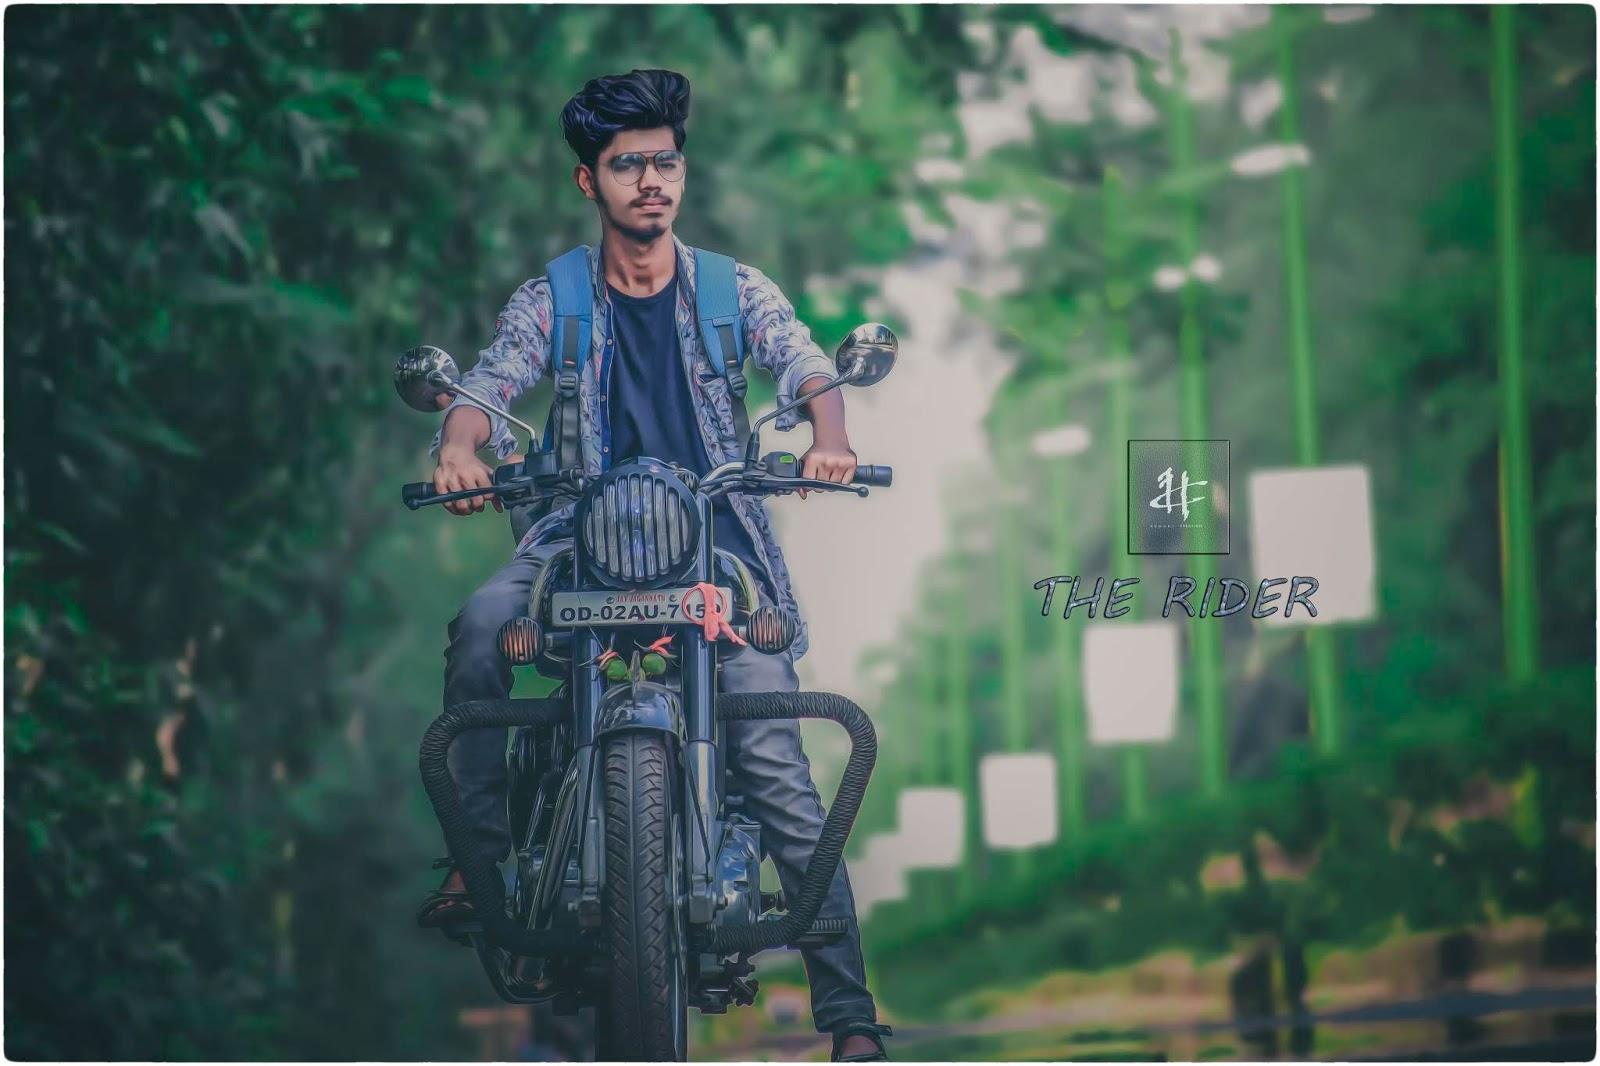 Model Photoshoot Pose And Edits Moel Photoshoot And Edits Model A Photo Shoot How To Have A Great Photoshoot In Hindi